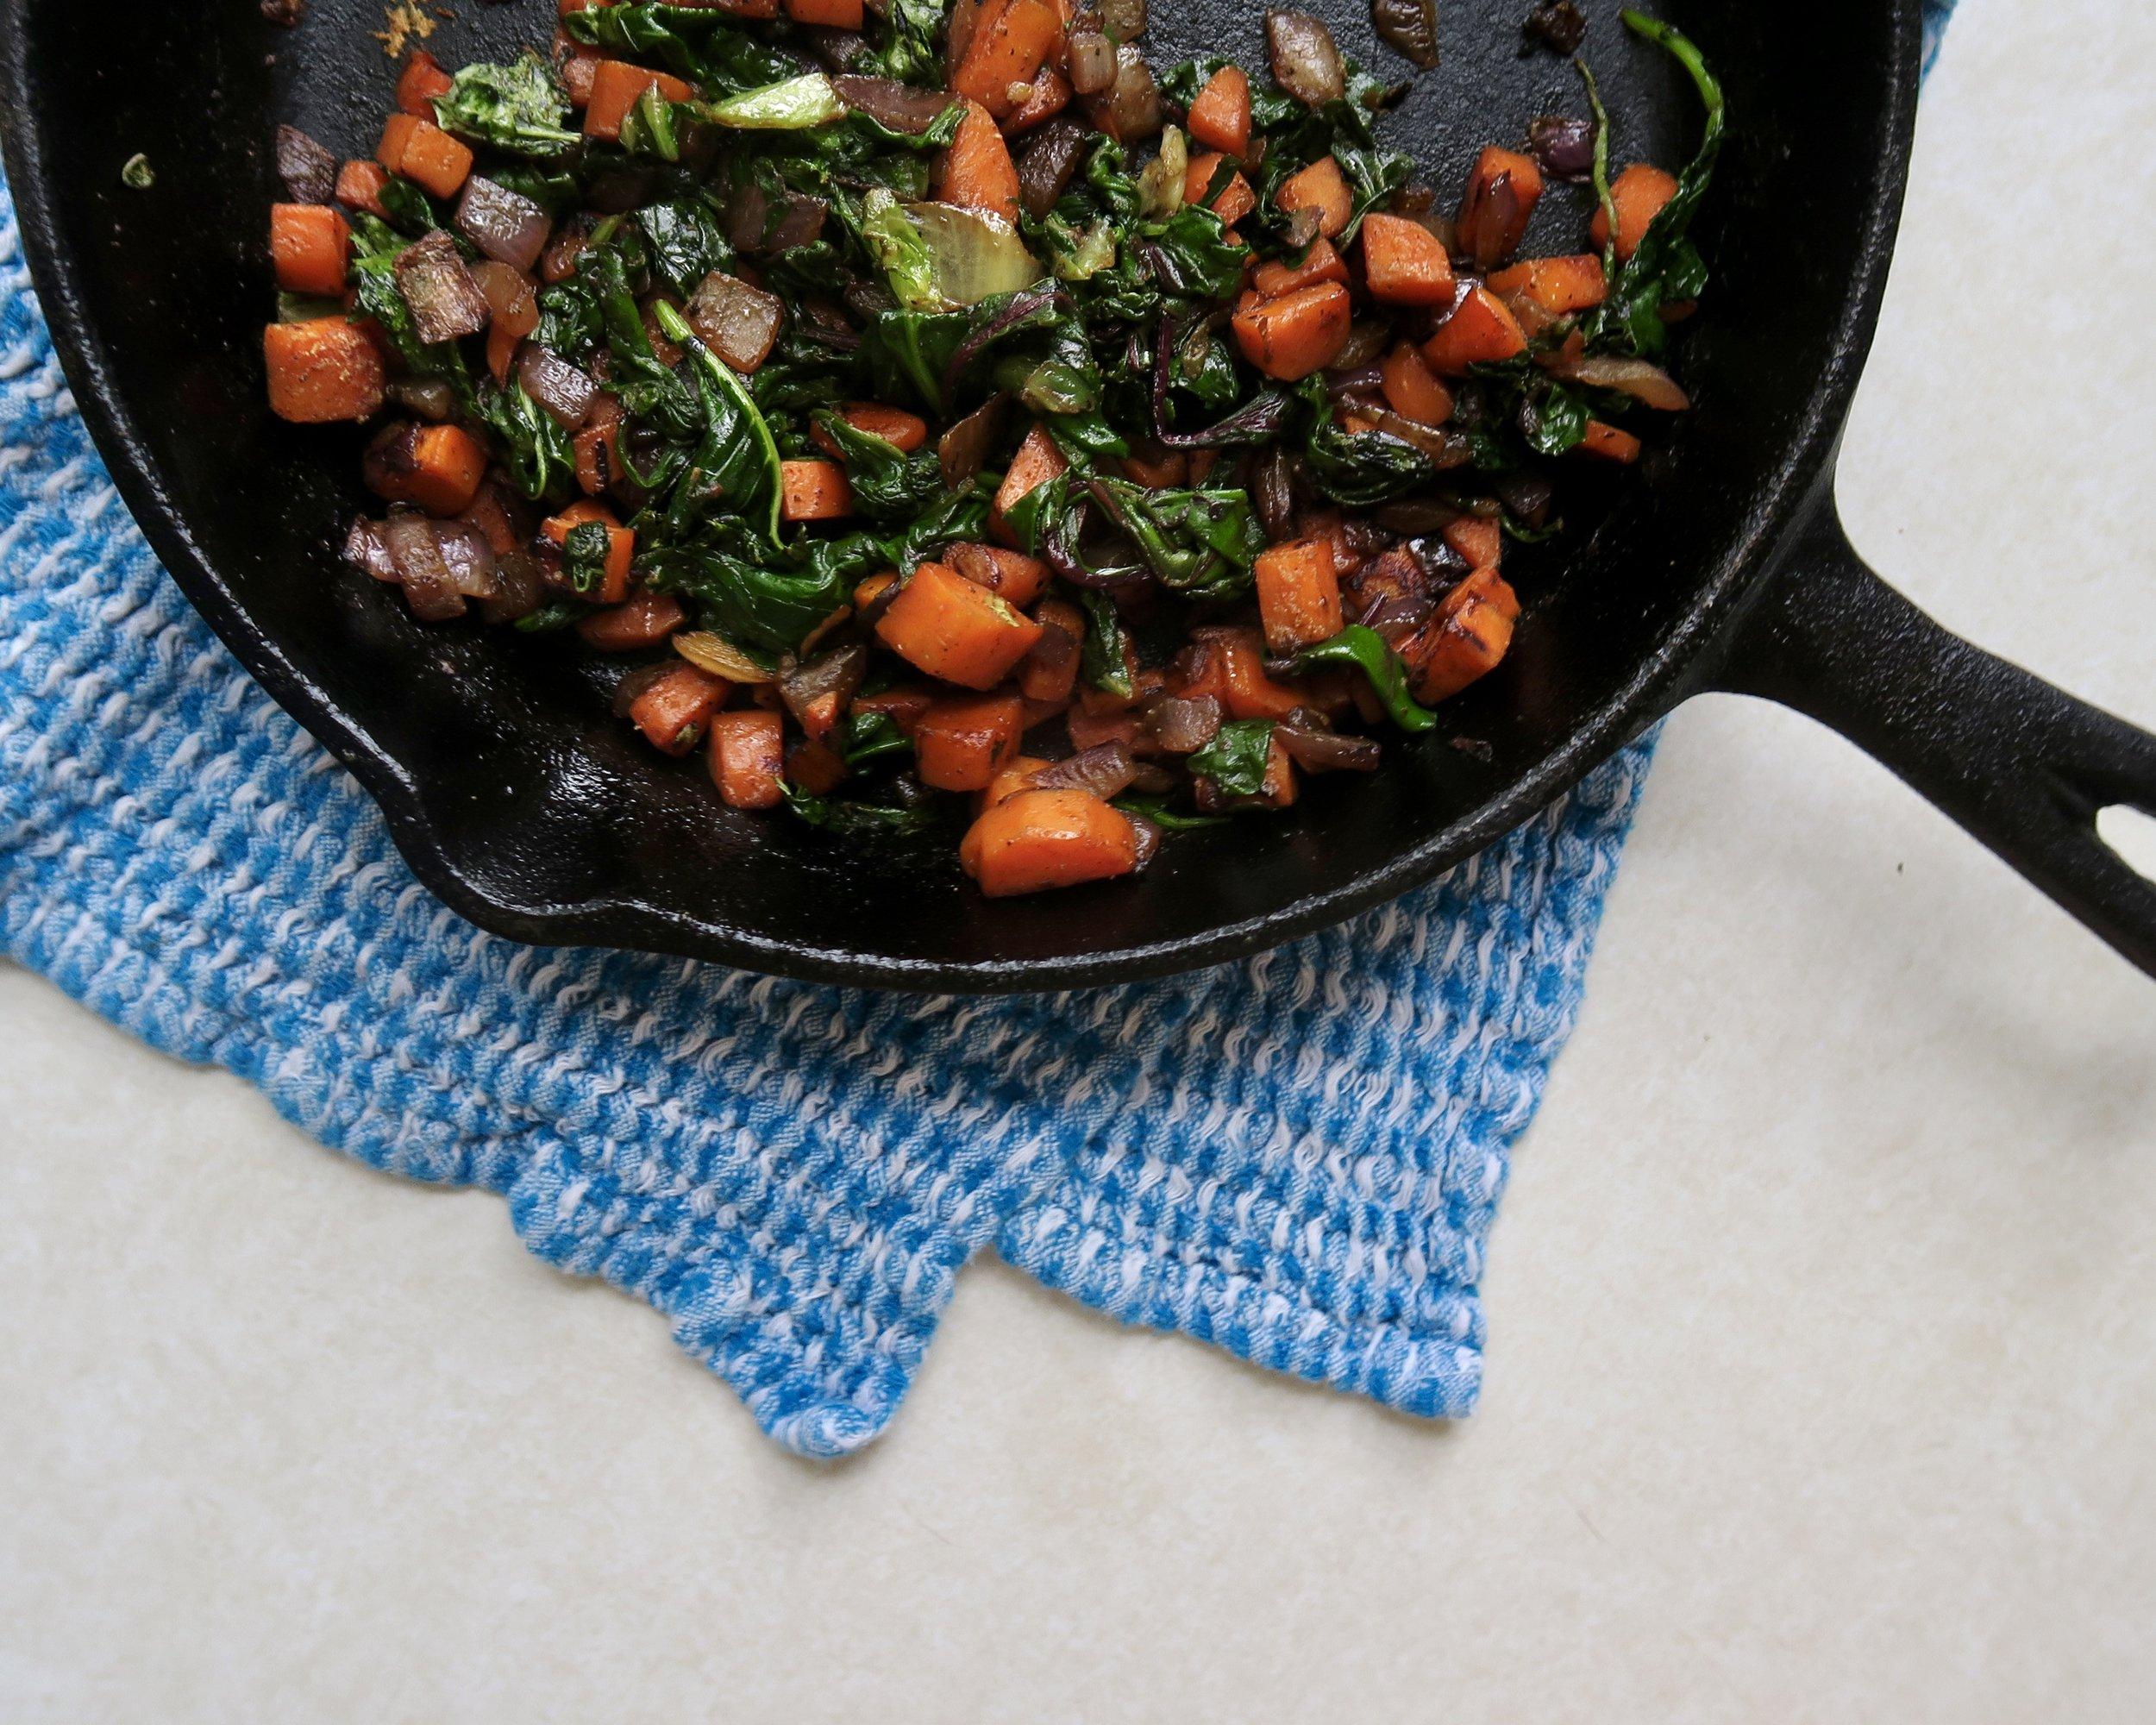 Breakfast Mixed Veggies, Lake Superior Kitchen